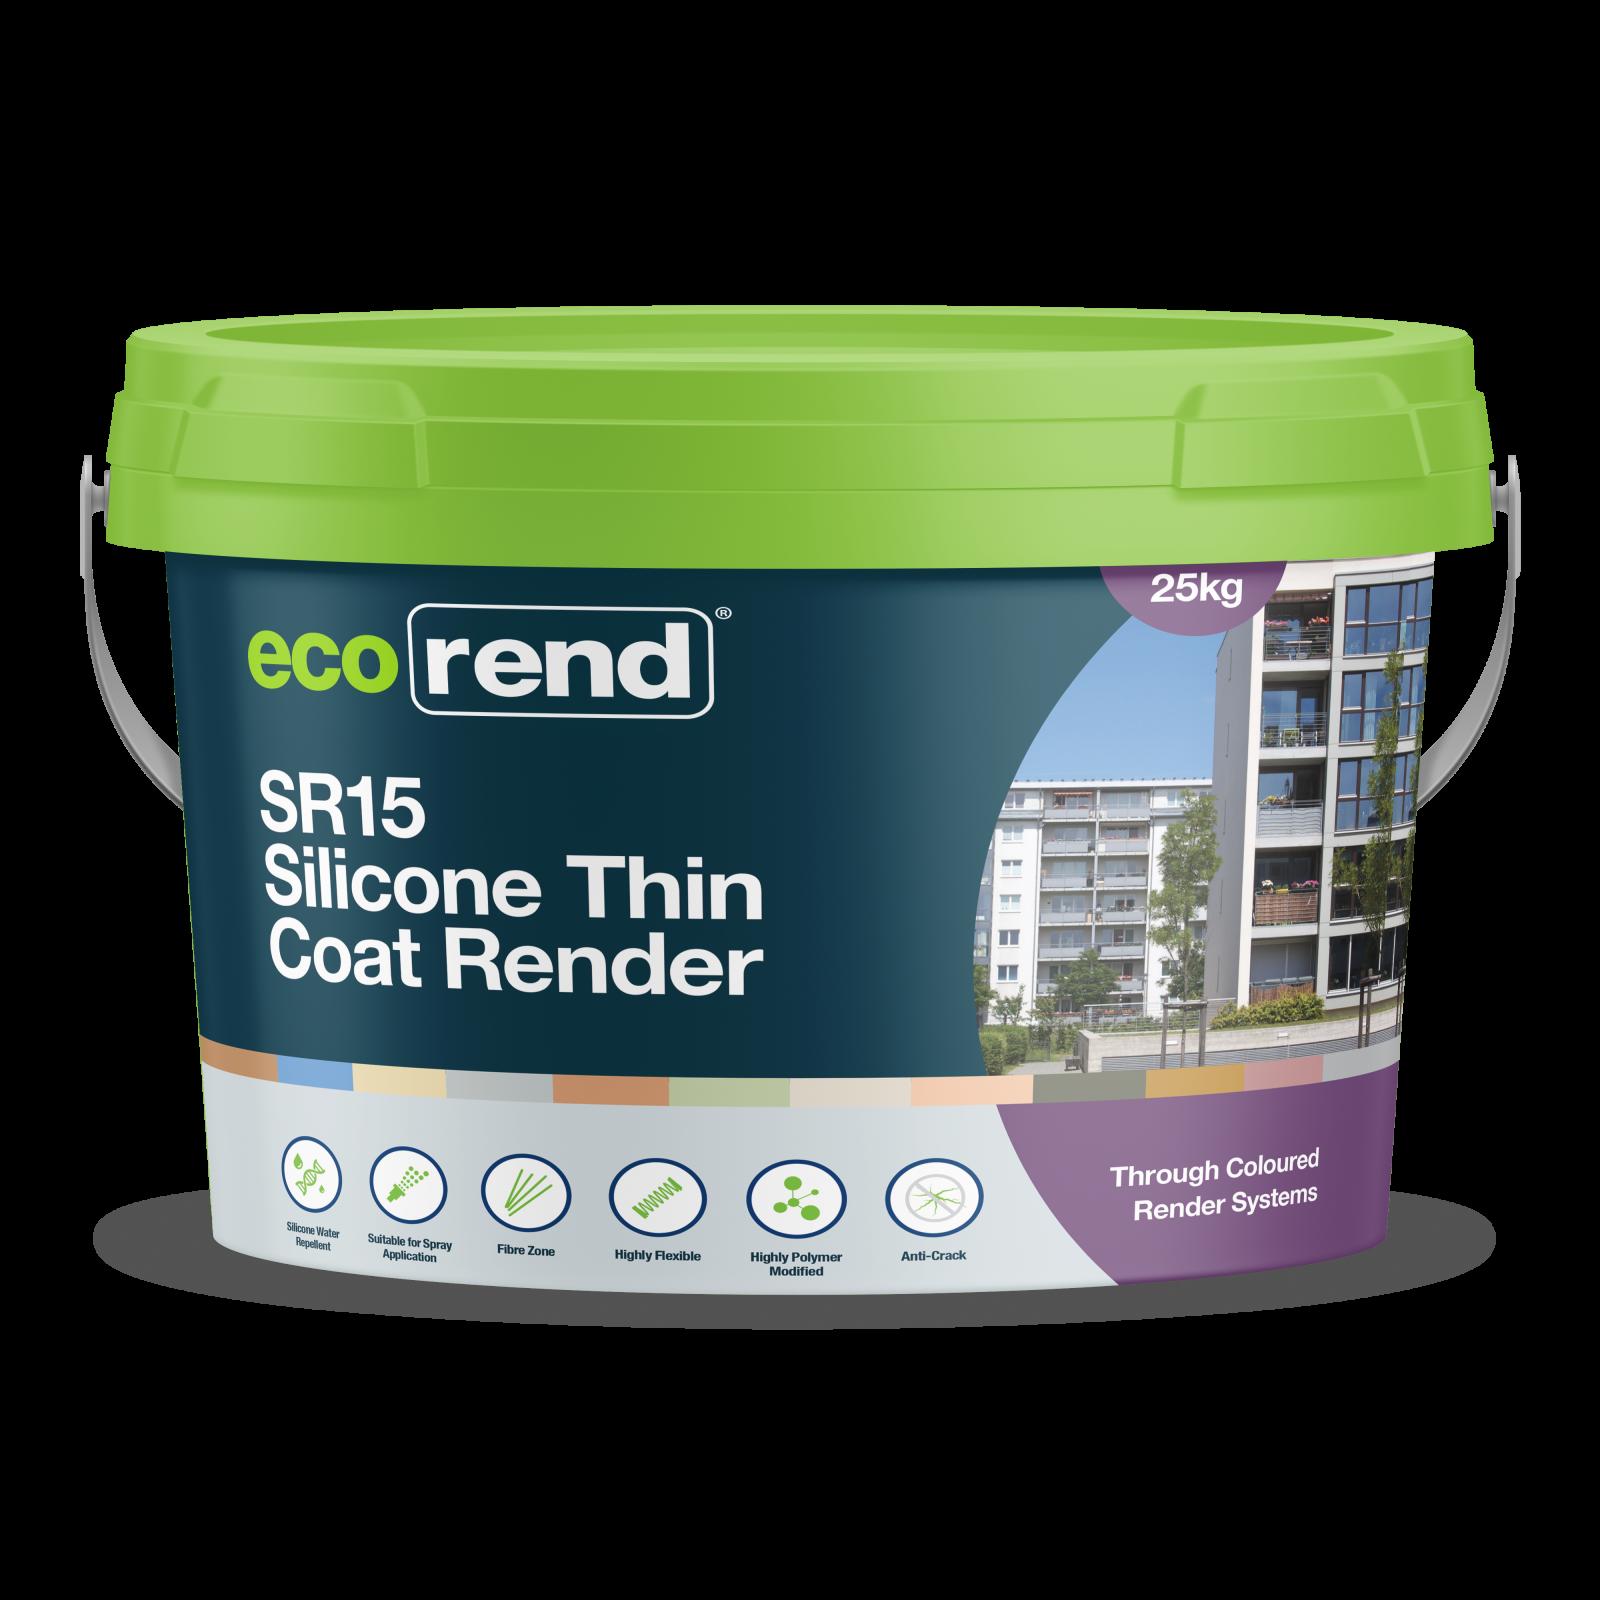 Ecorend SR15 Silicone Thin coat render 25kg tub